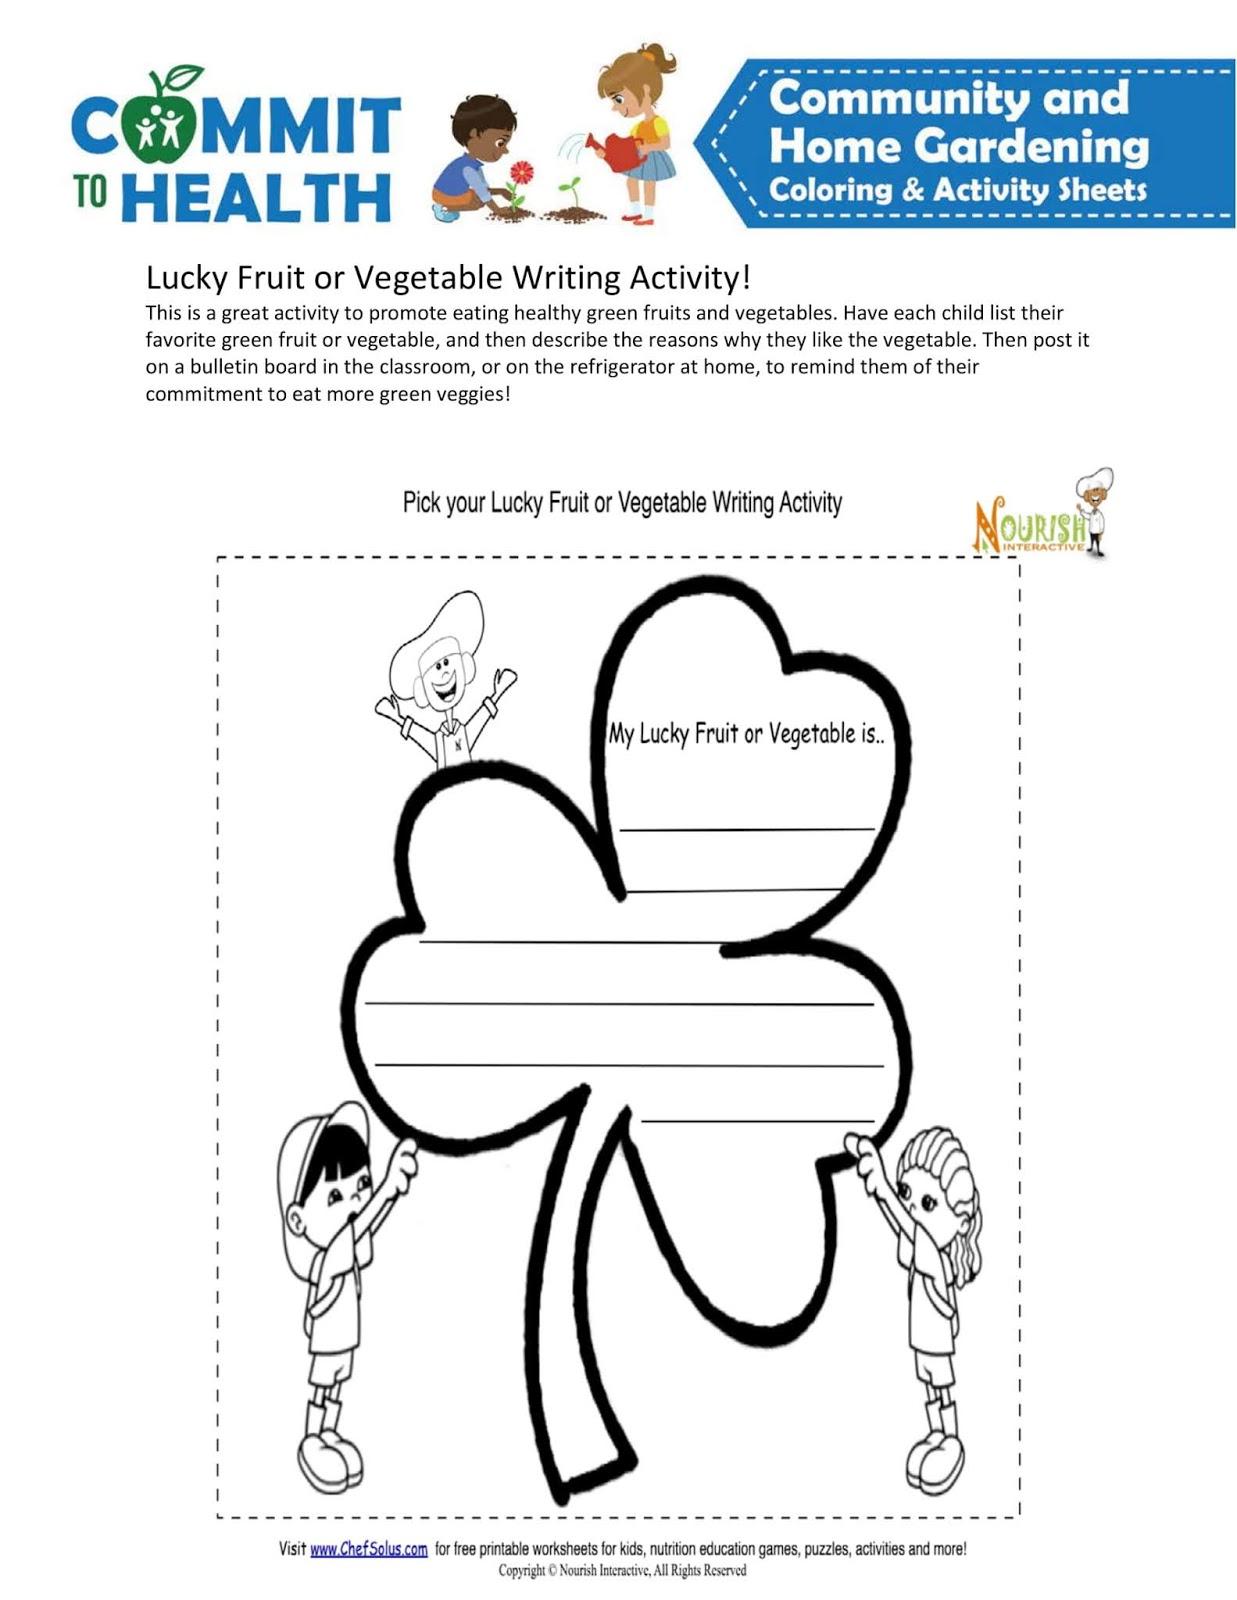 March coloring activity sheets gardening community home grades 3-5 -  Raste-enblog2 [ 1600 x 1237 Pixel ]